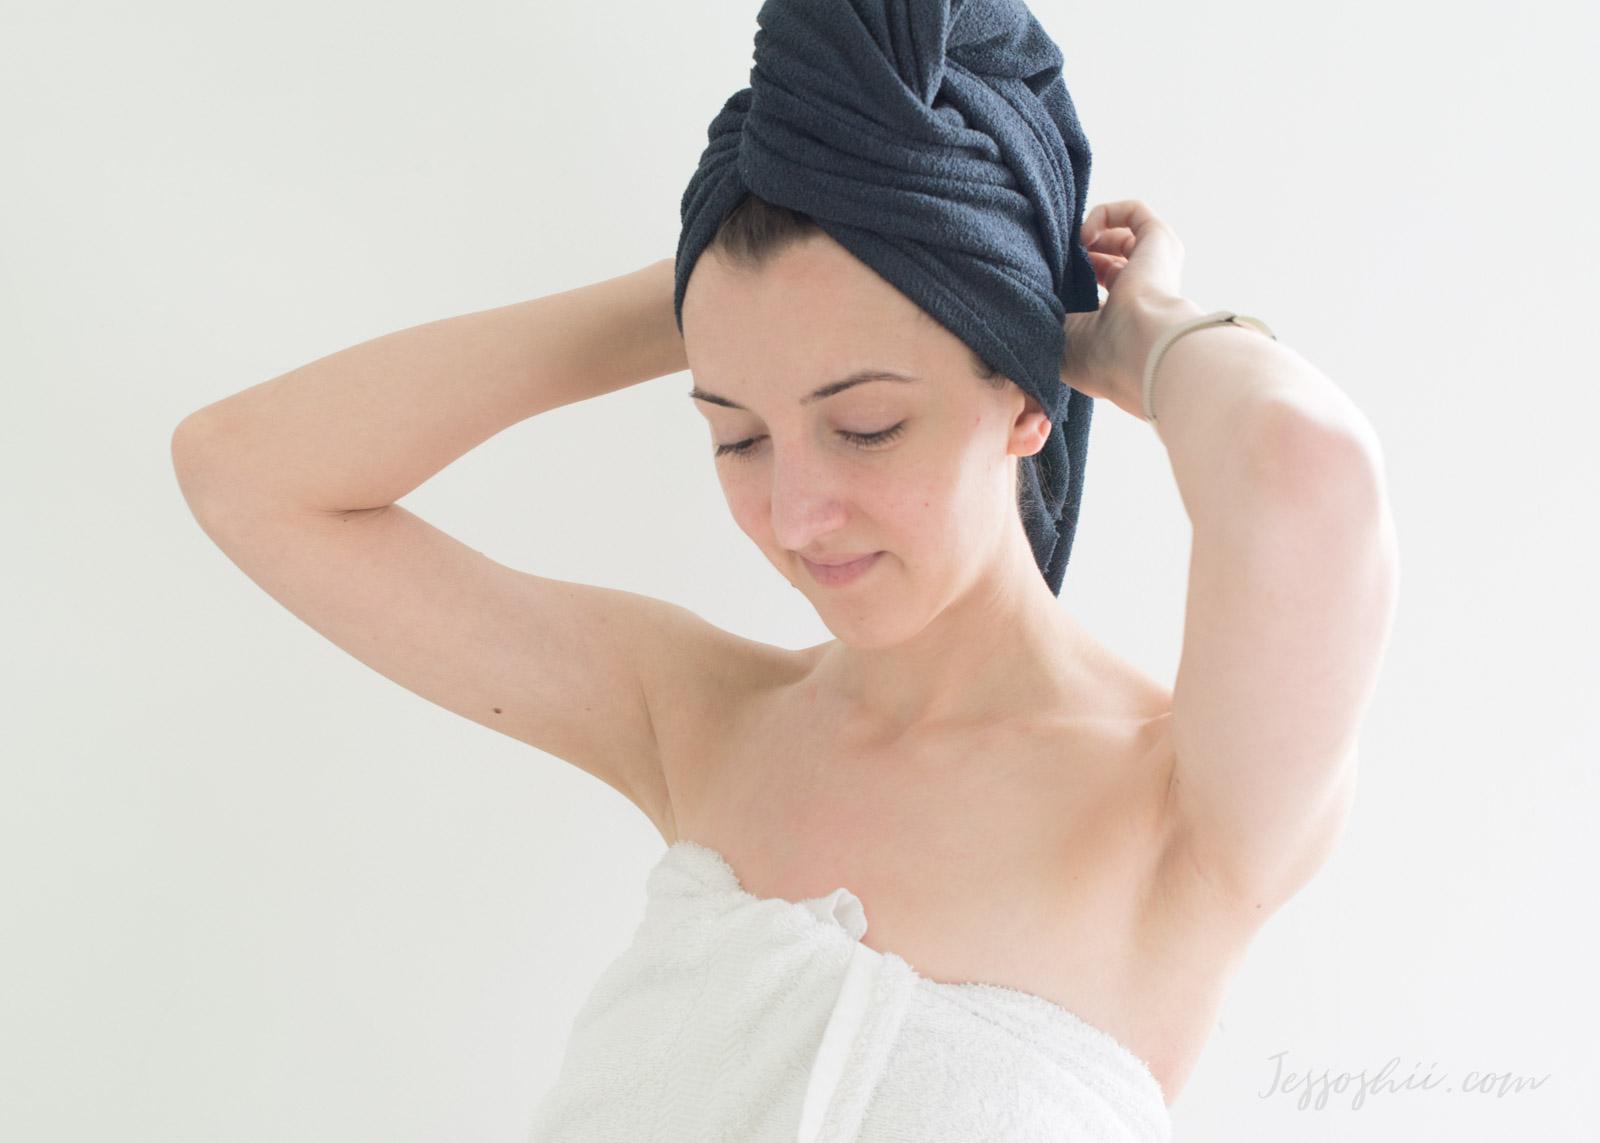 Aquis Lisse Luxe Hair Turban and Hair Towel